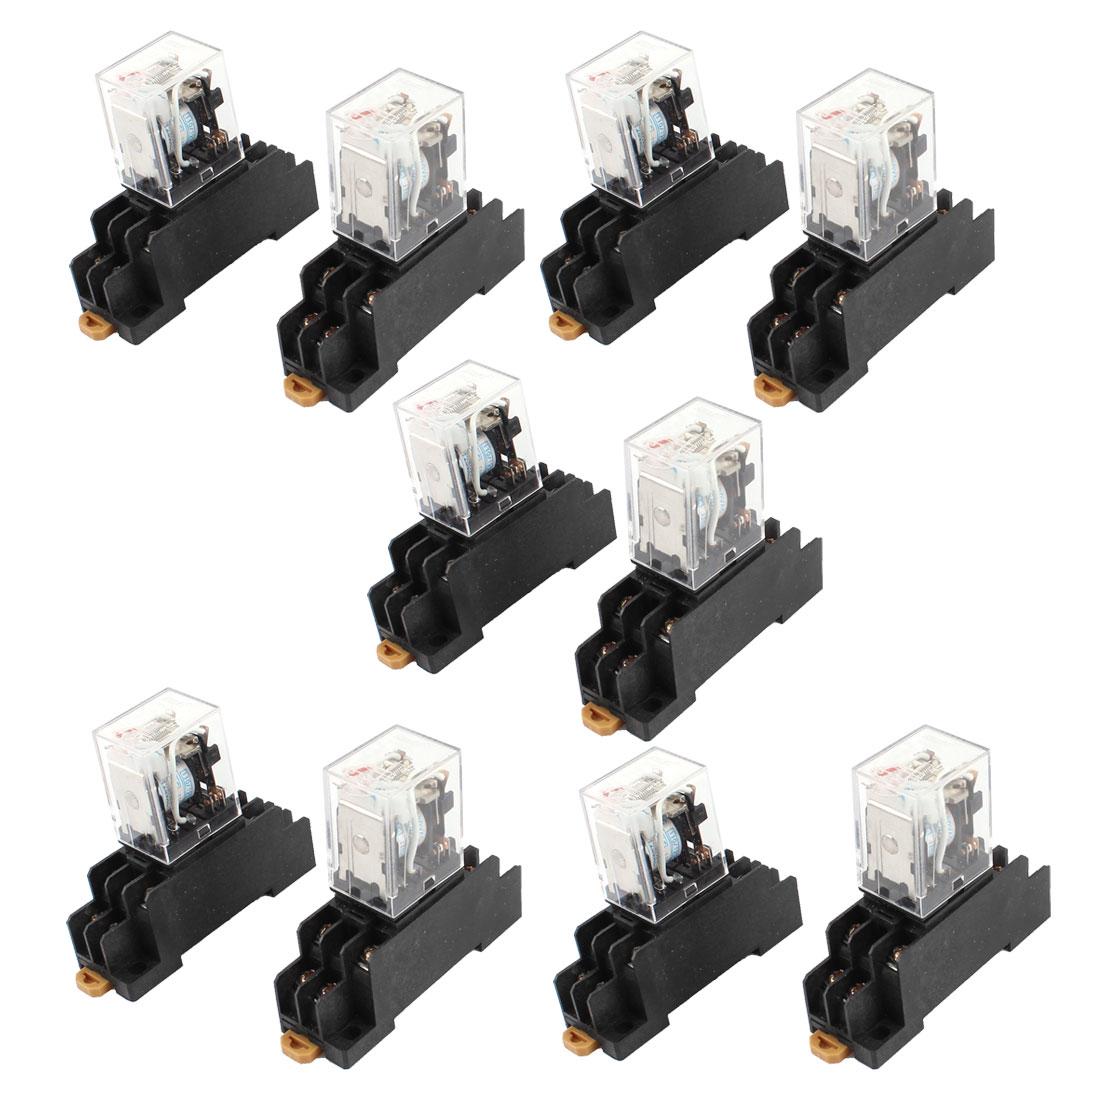 AC 110/120V Coil Red Indicator Light DPDT 8 Pins Power Relay + Socket Base